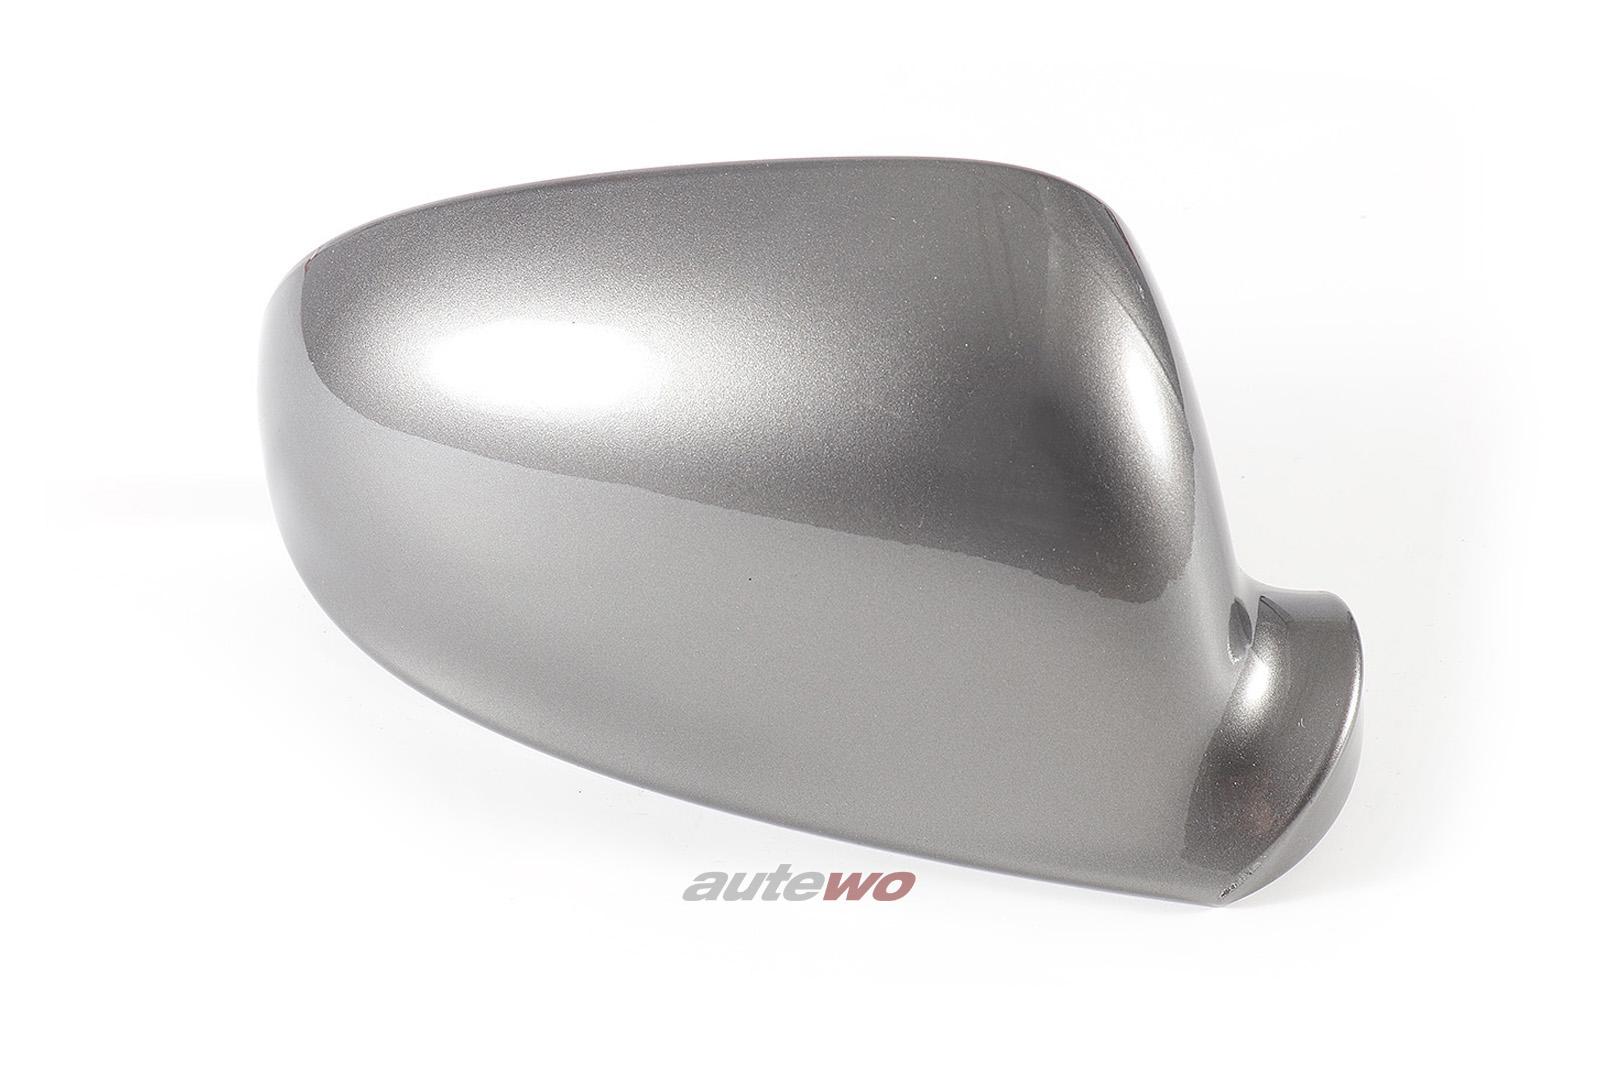 1K0857538 Seat/Skoda/VW Alhambra/Passat/Sharan Außenspiegel Kappe rechts